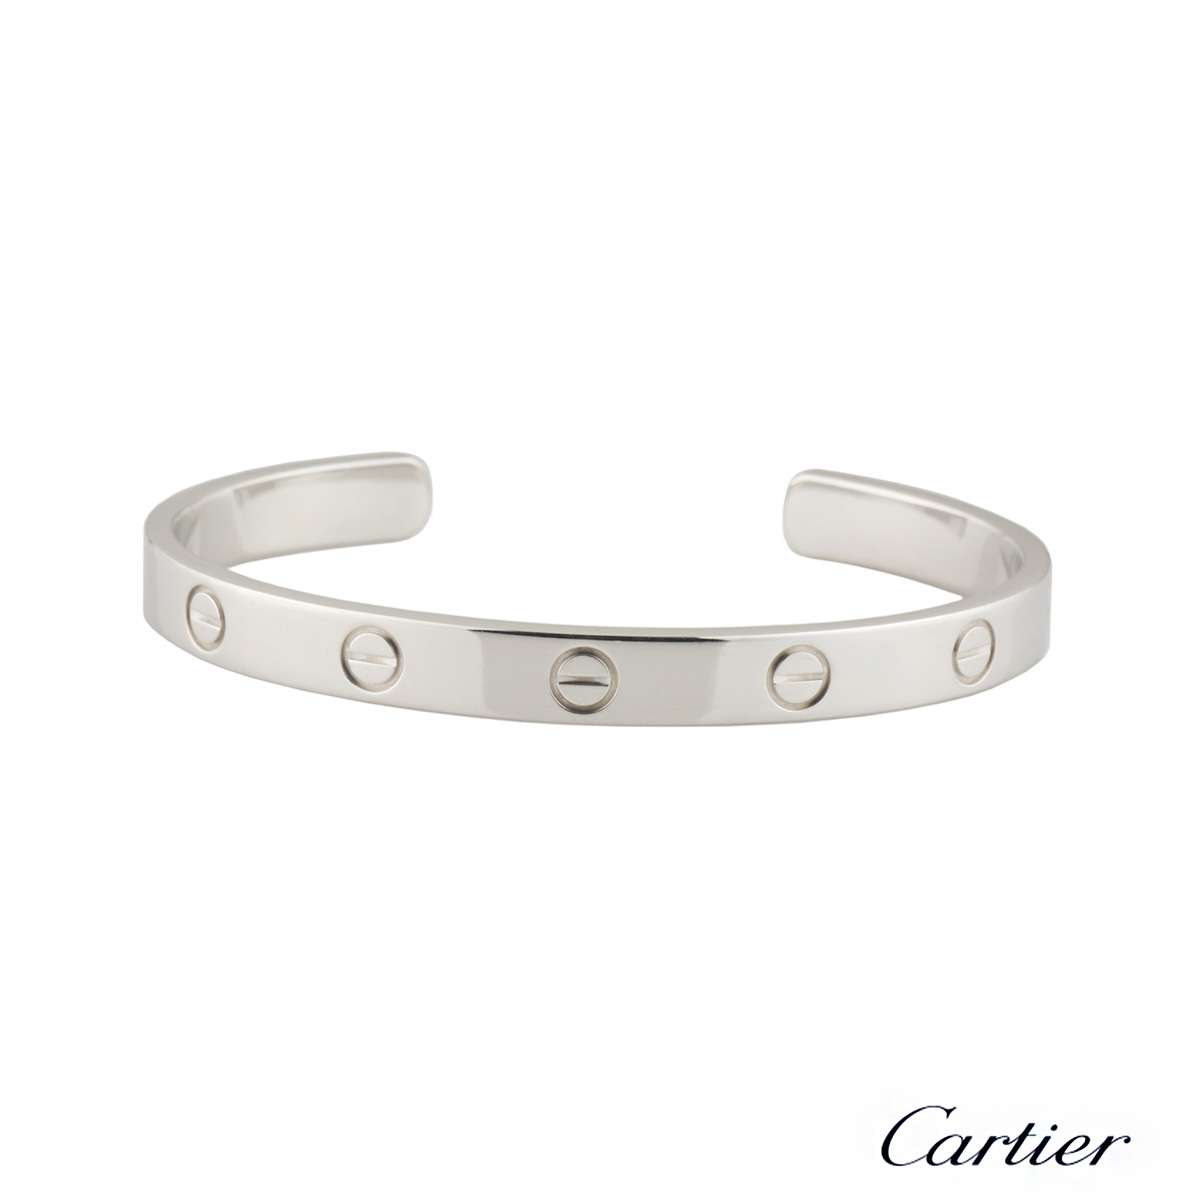 Cartier Love Cuff Bracelet Size 17 B6032517